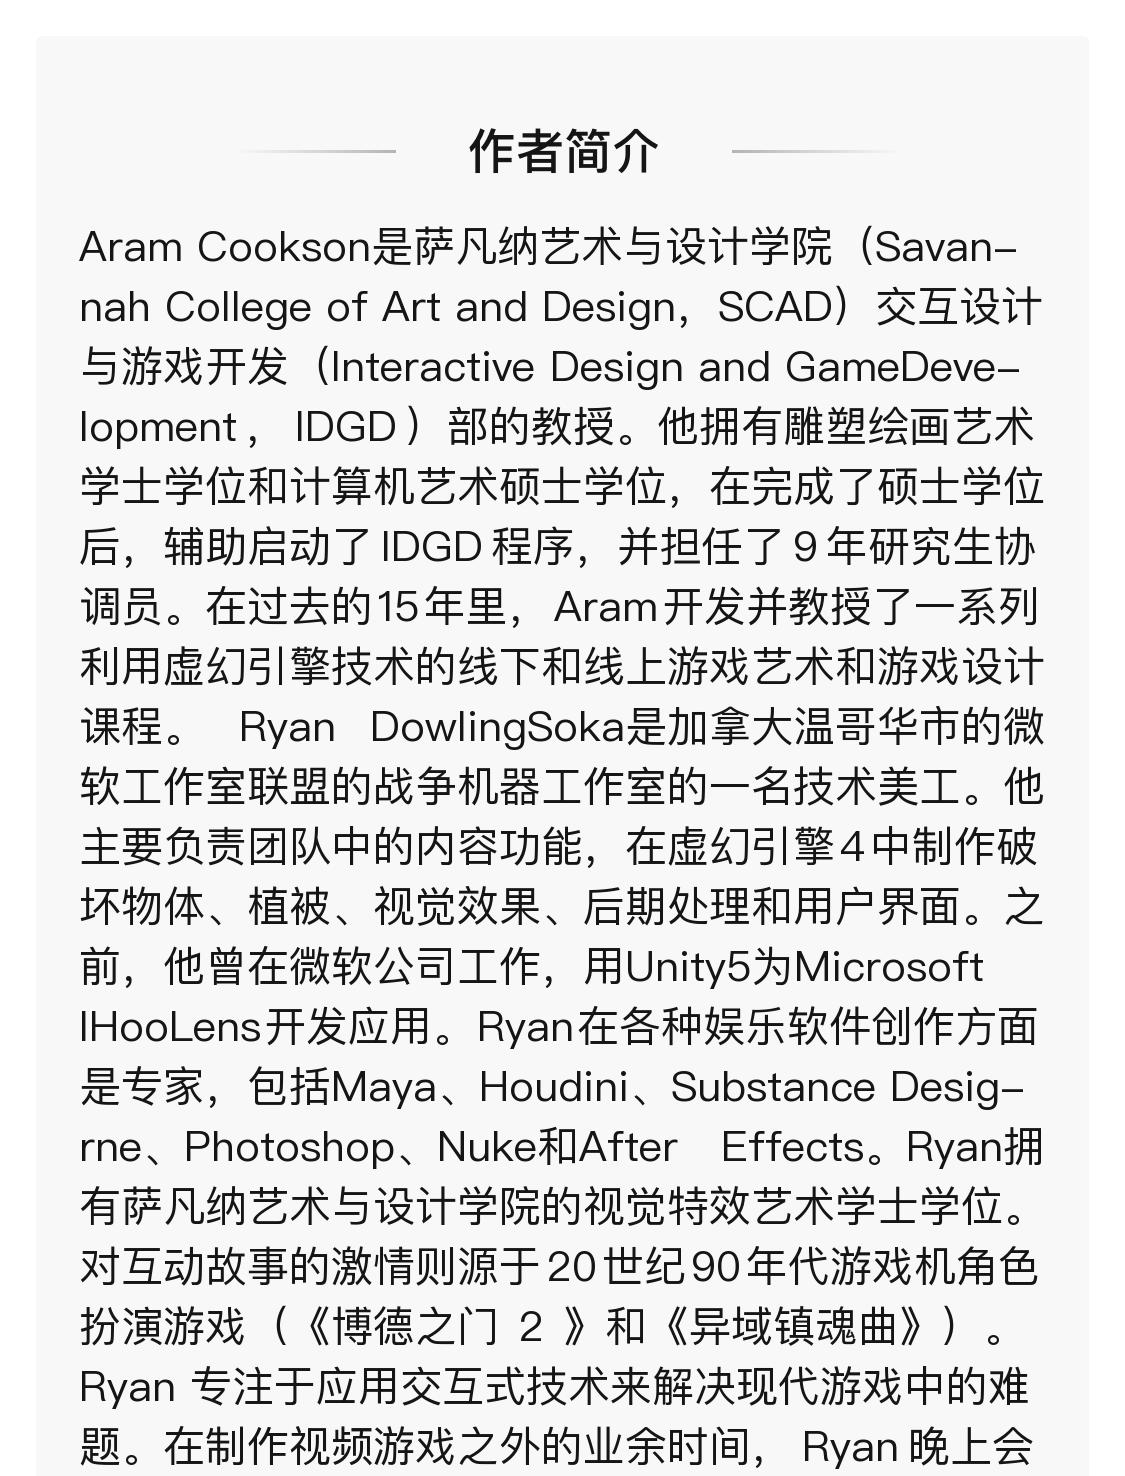 JM藝術家 圖書 農業 高考 Unreal Engine 4游戲開發入門經典 虛幻引擎開發游戲制作與開發技【】